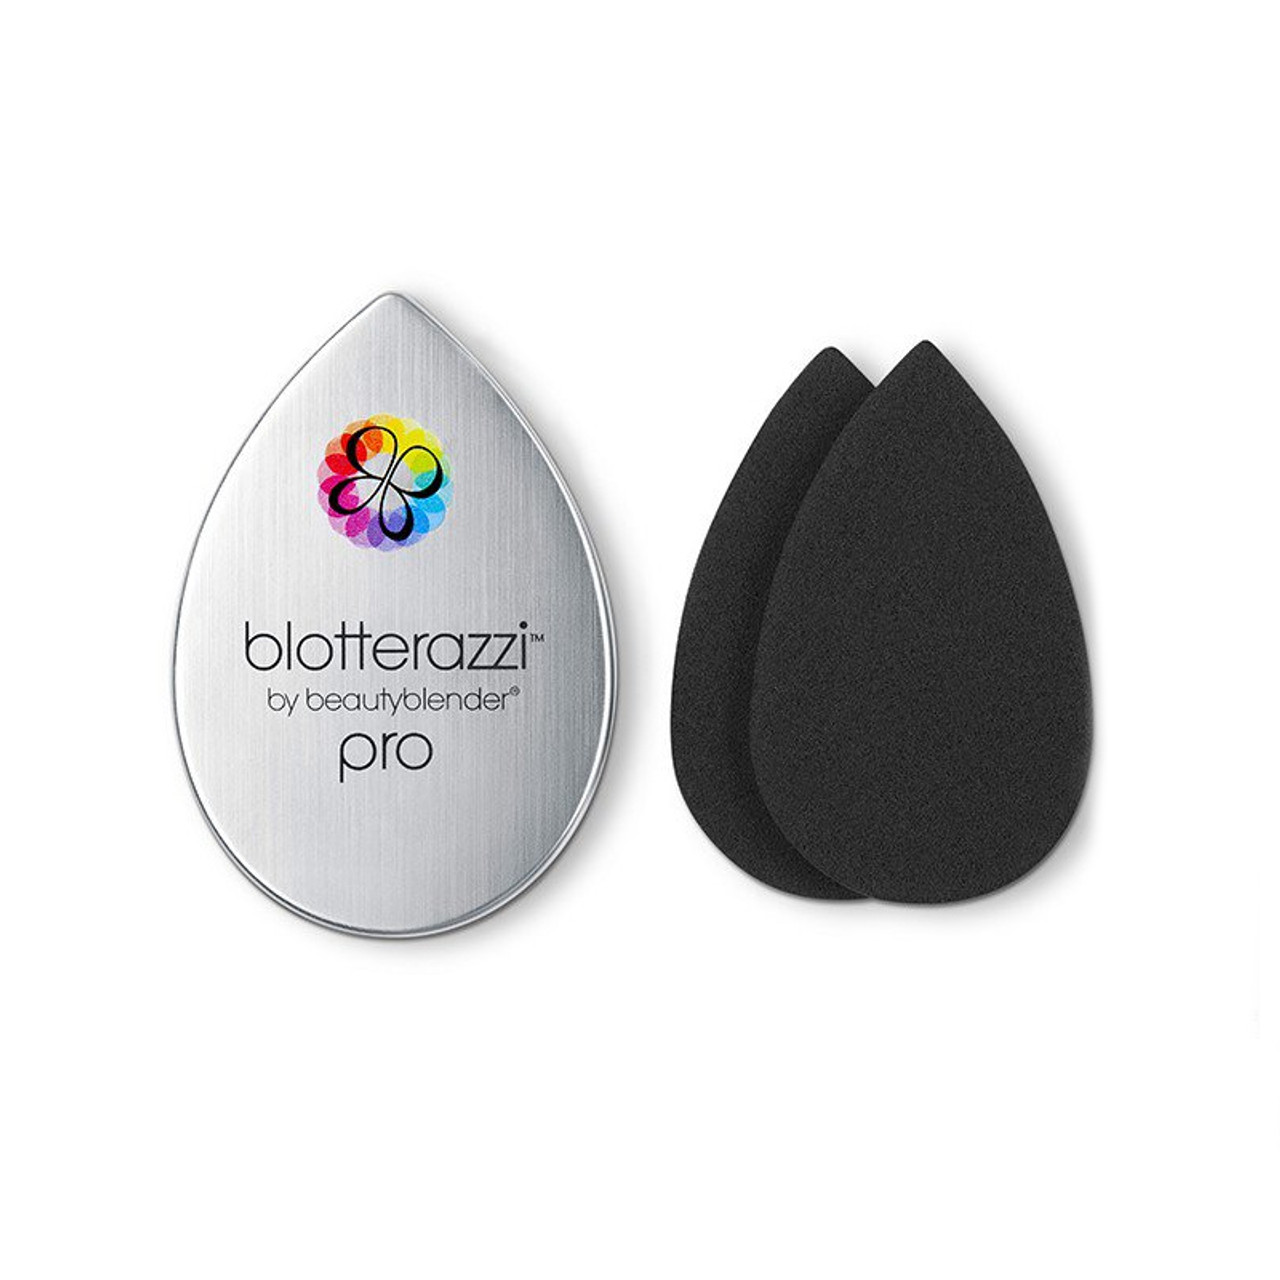 Blotterazzi Pro by beautyblender